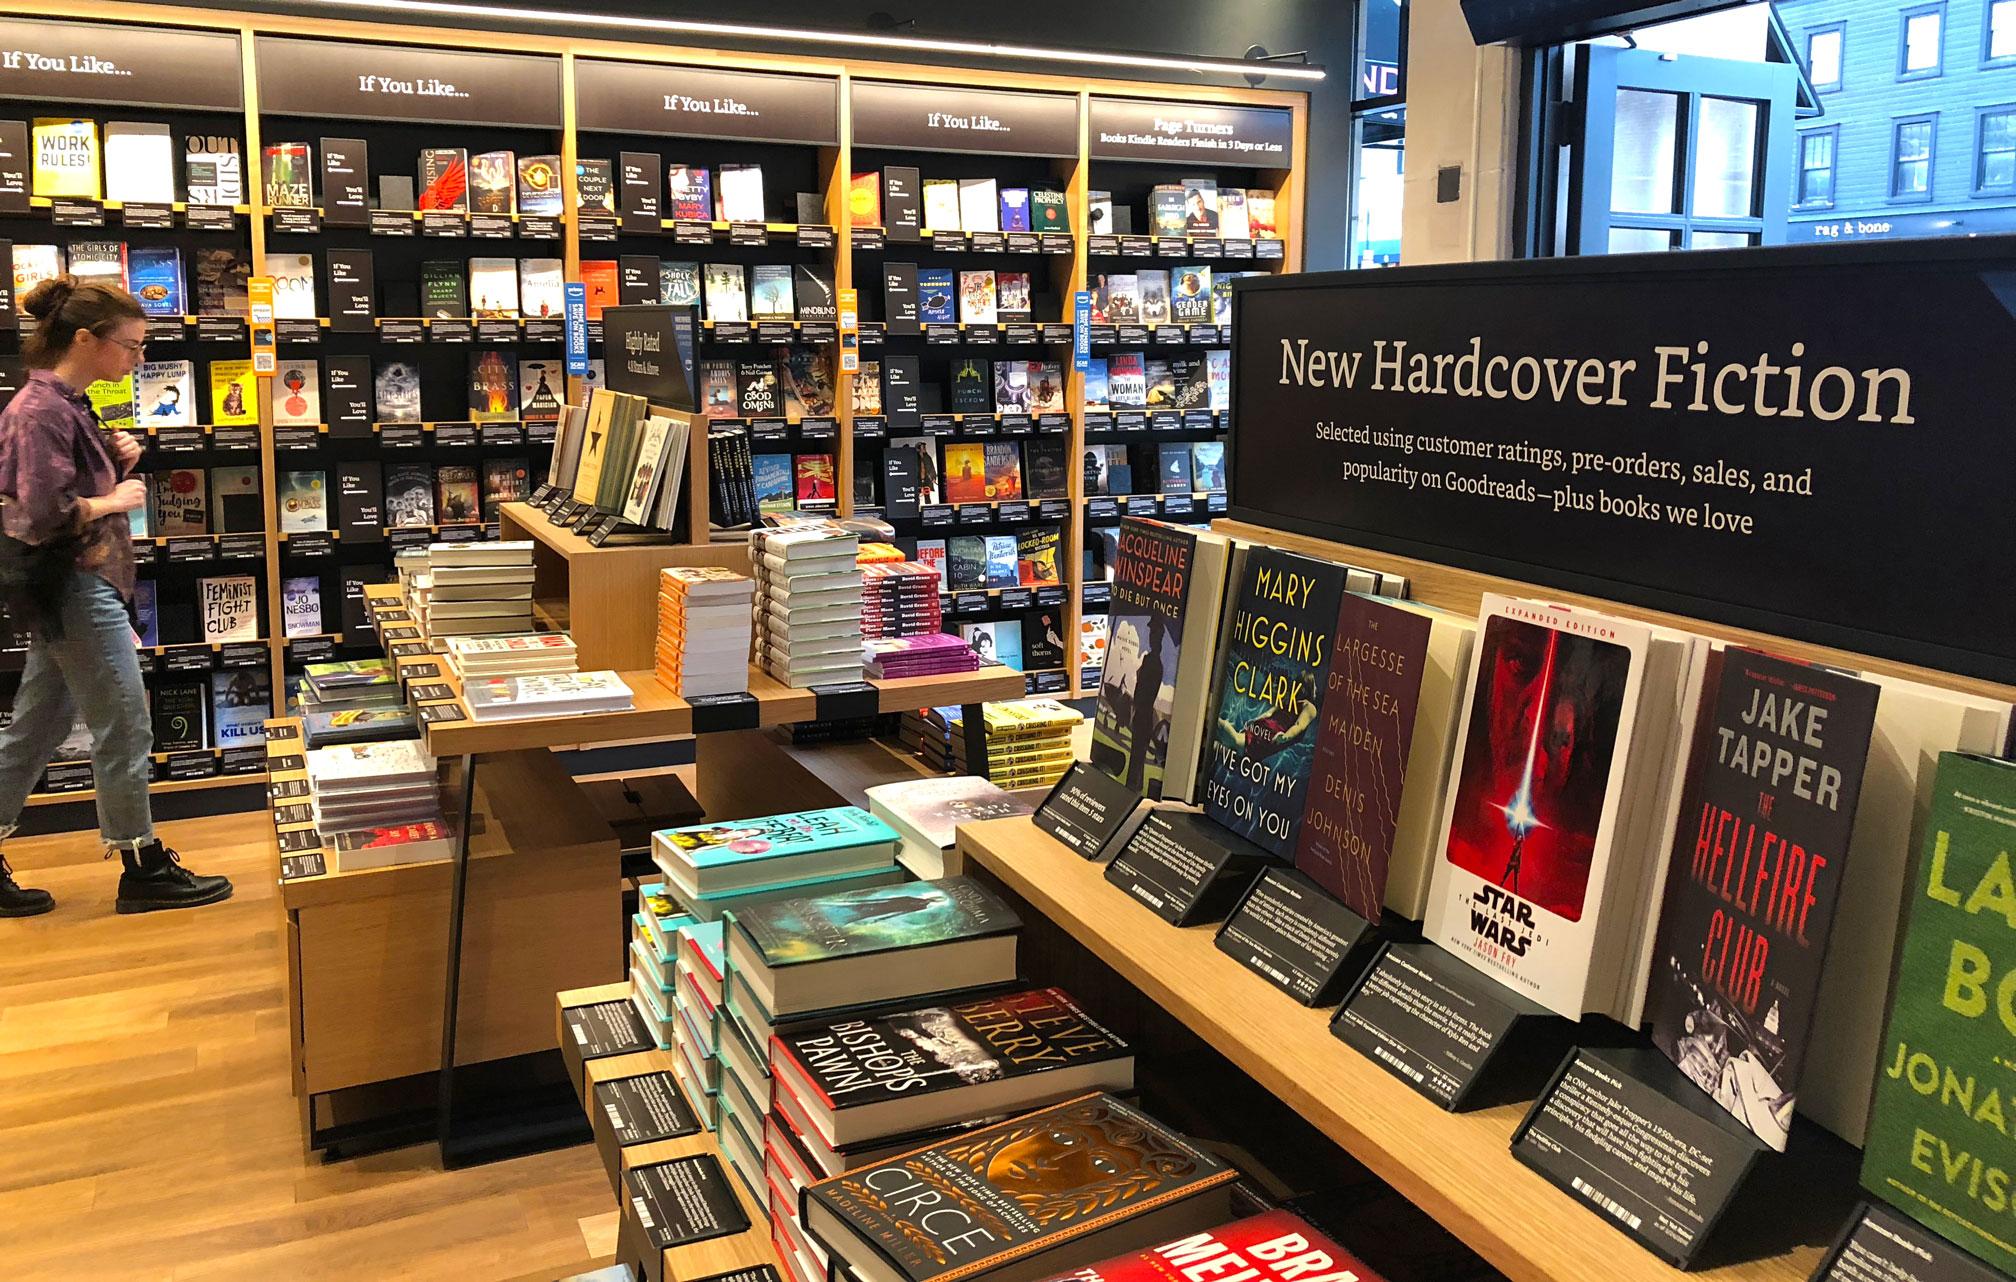 amazon-bookstore-cover-image.jpg